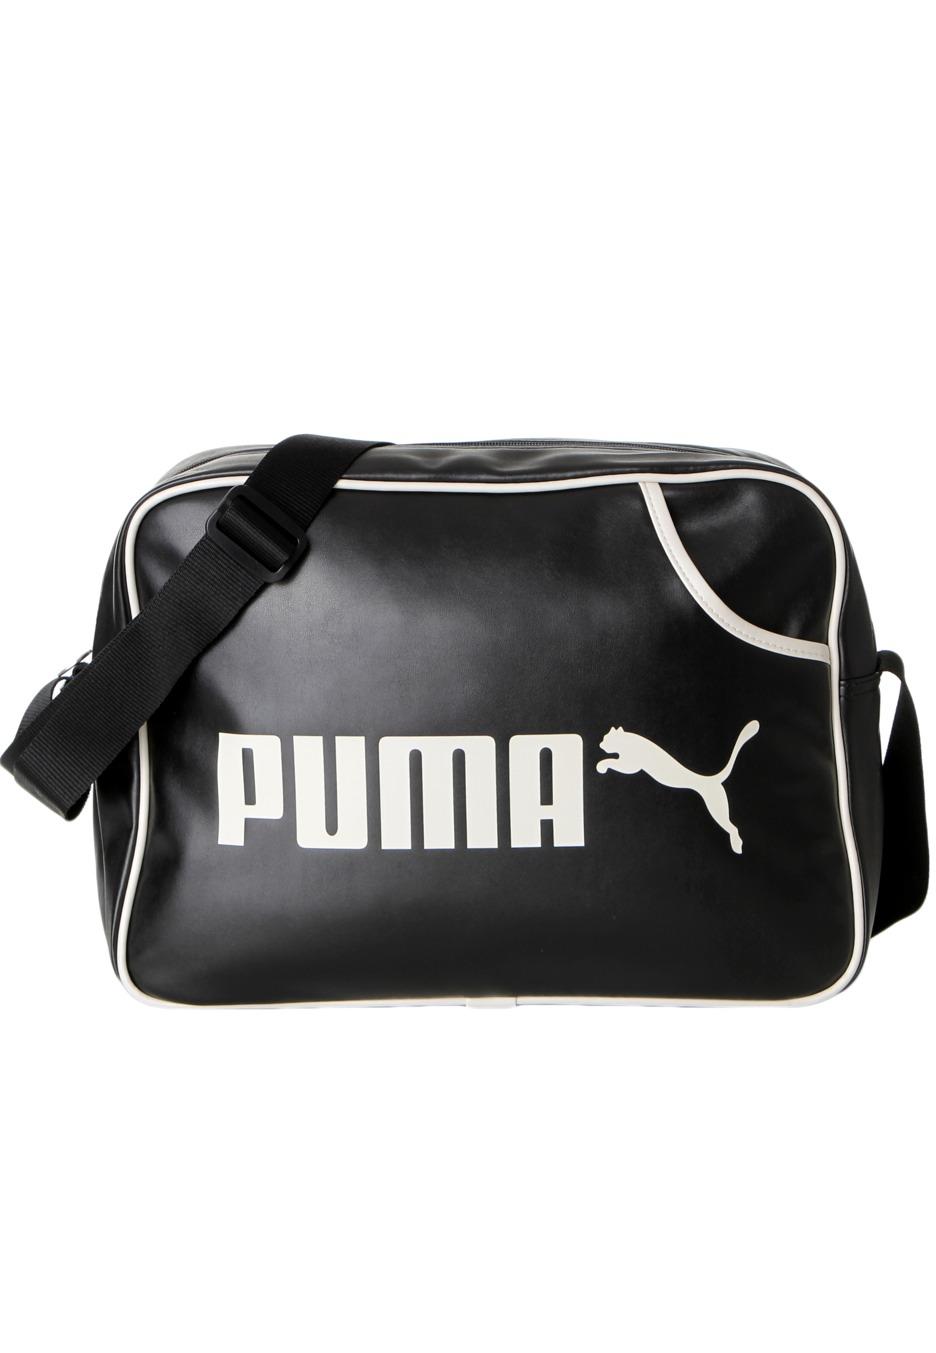 Puma - Campus Reporter Black/Birch - Bag - Streetwear Shop - Impericon.com  US